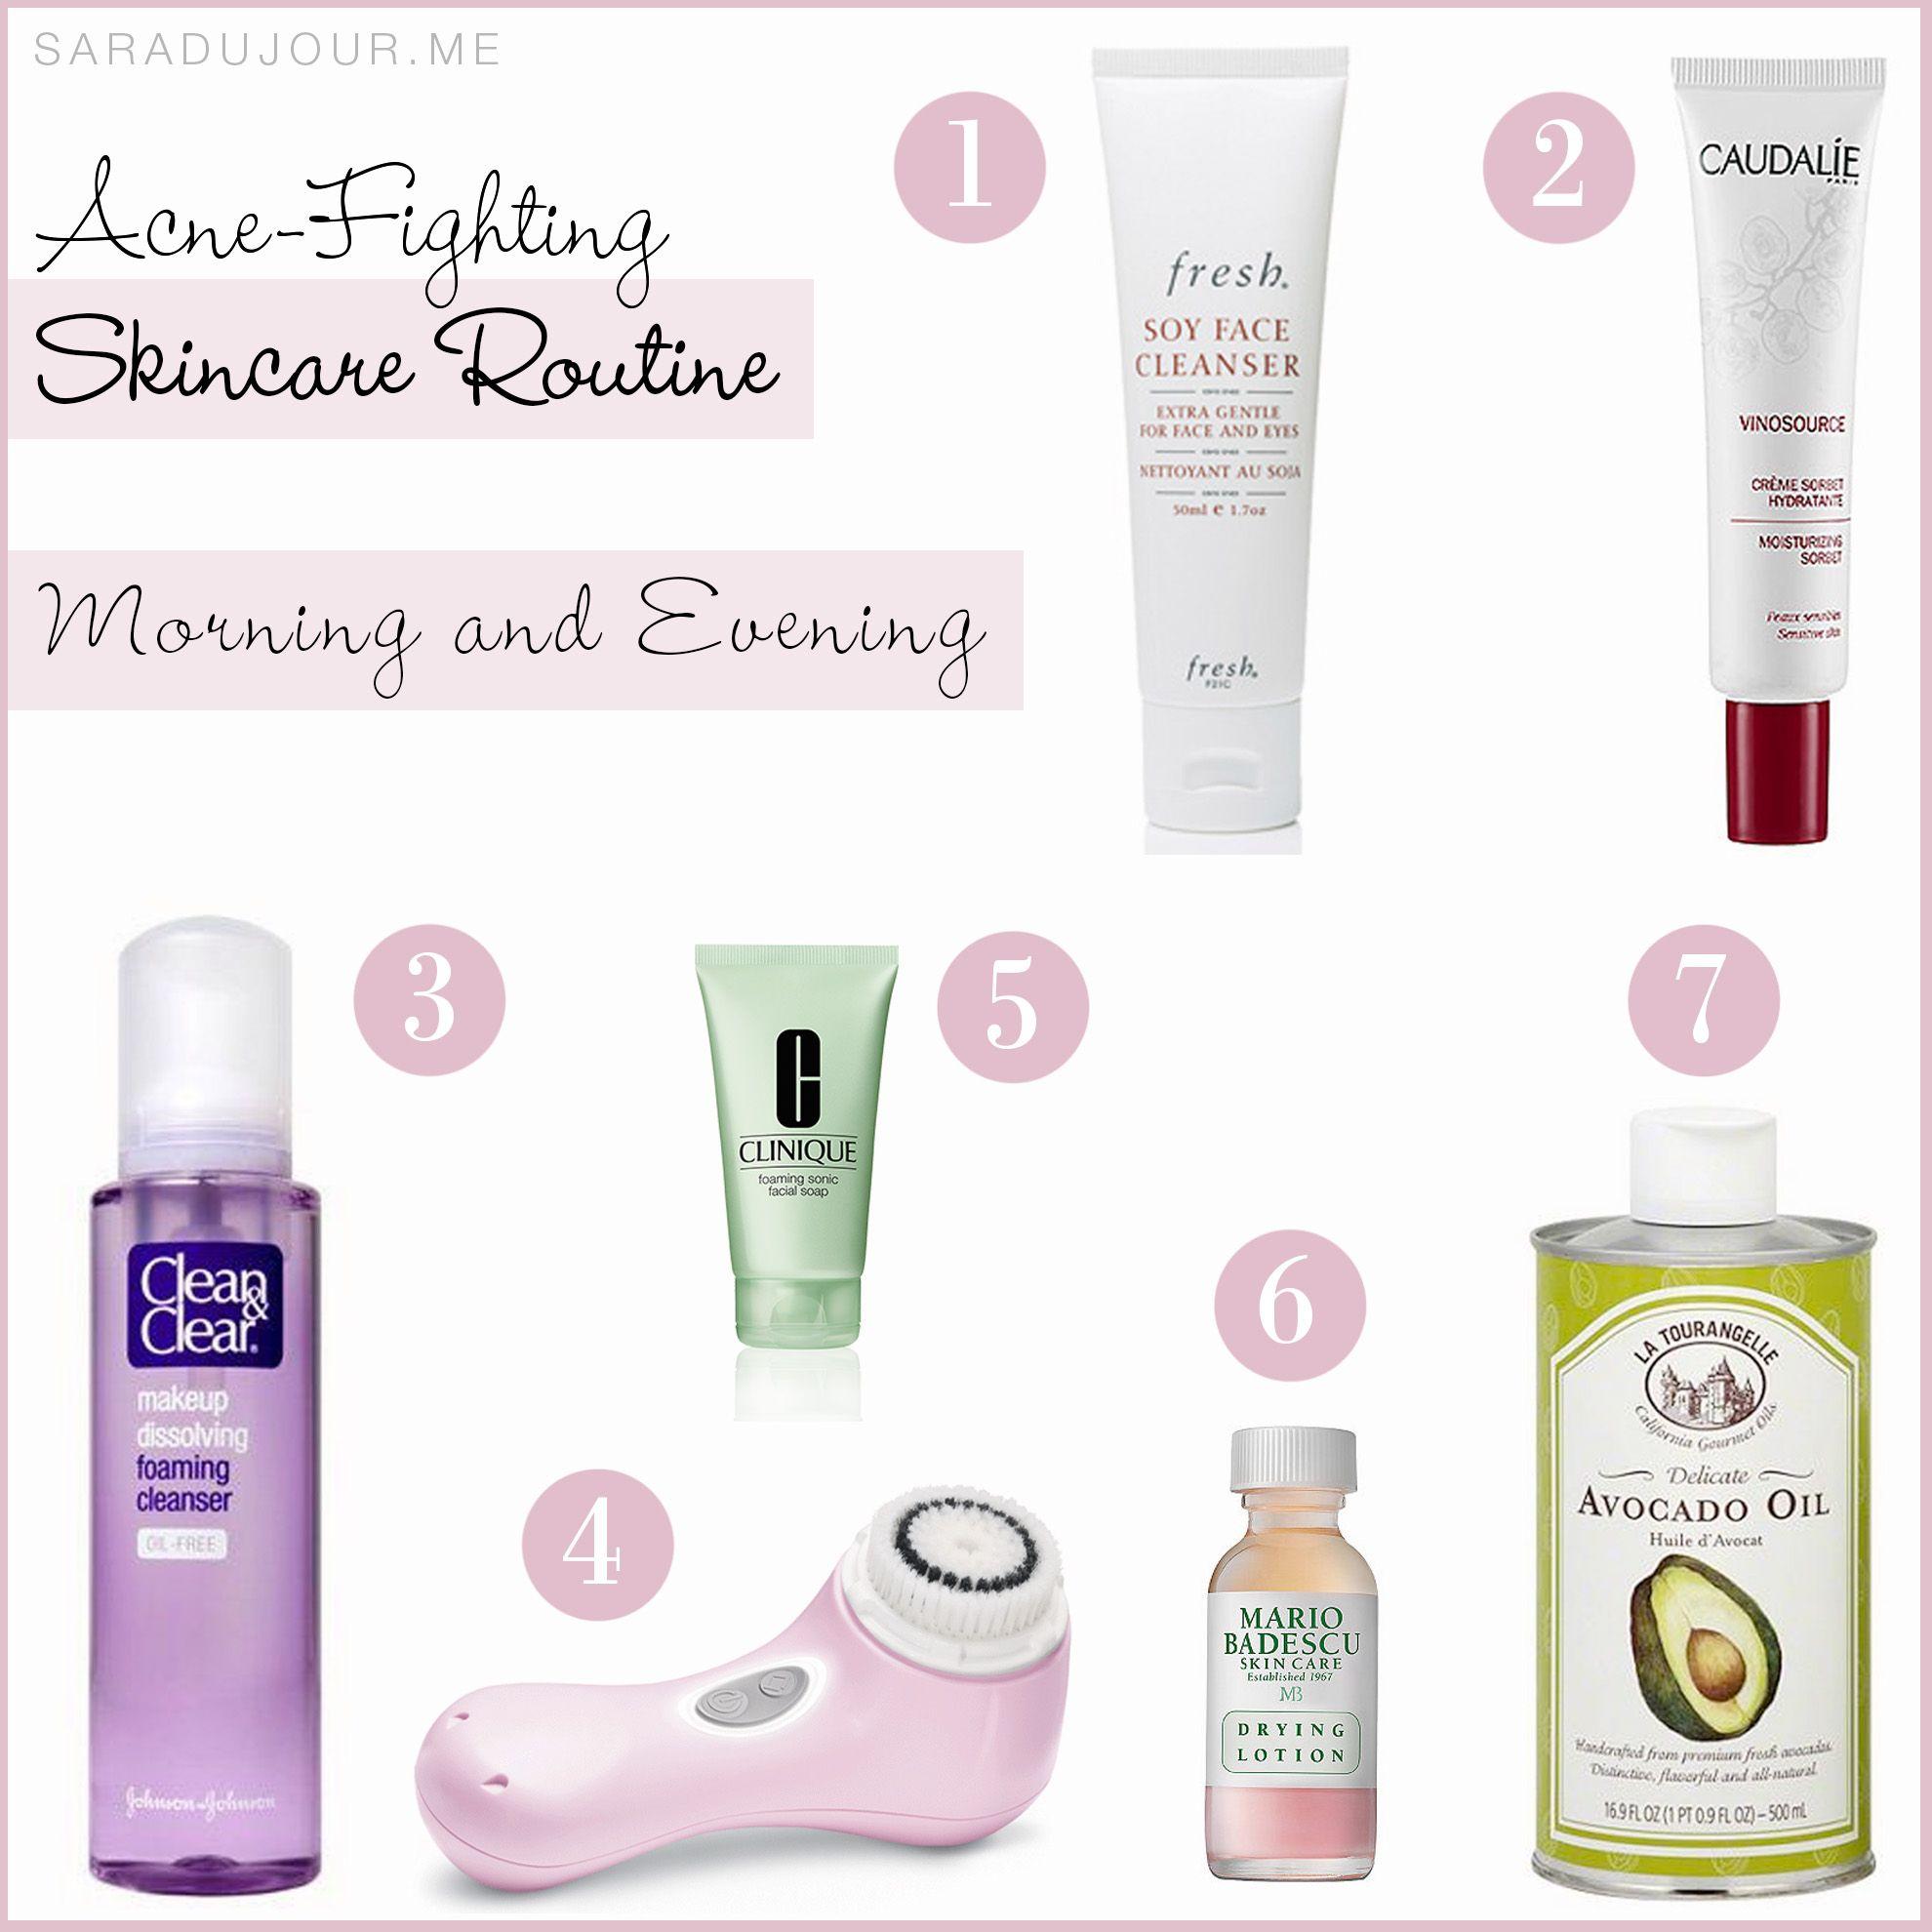 My AcneFighting Skincare Routine Night skin care